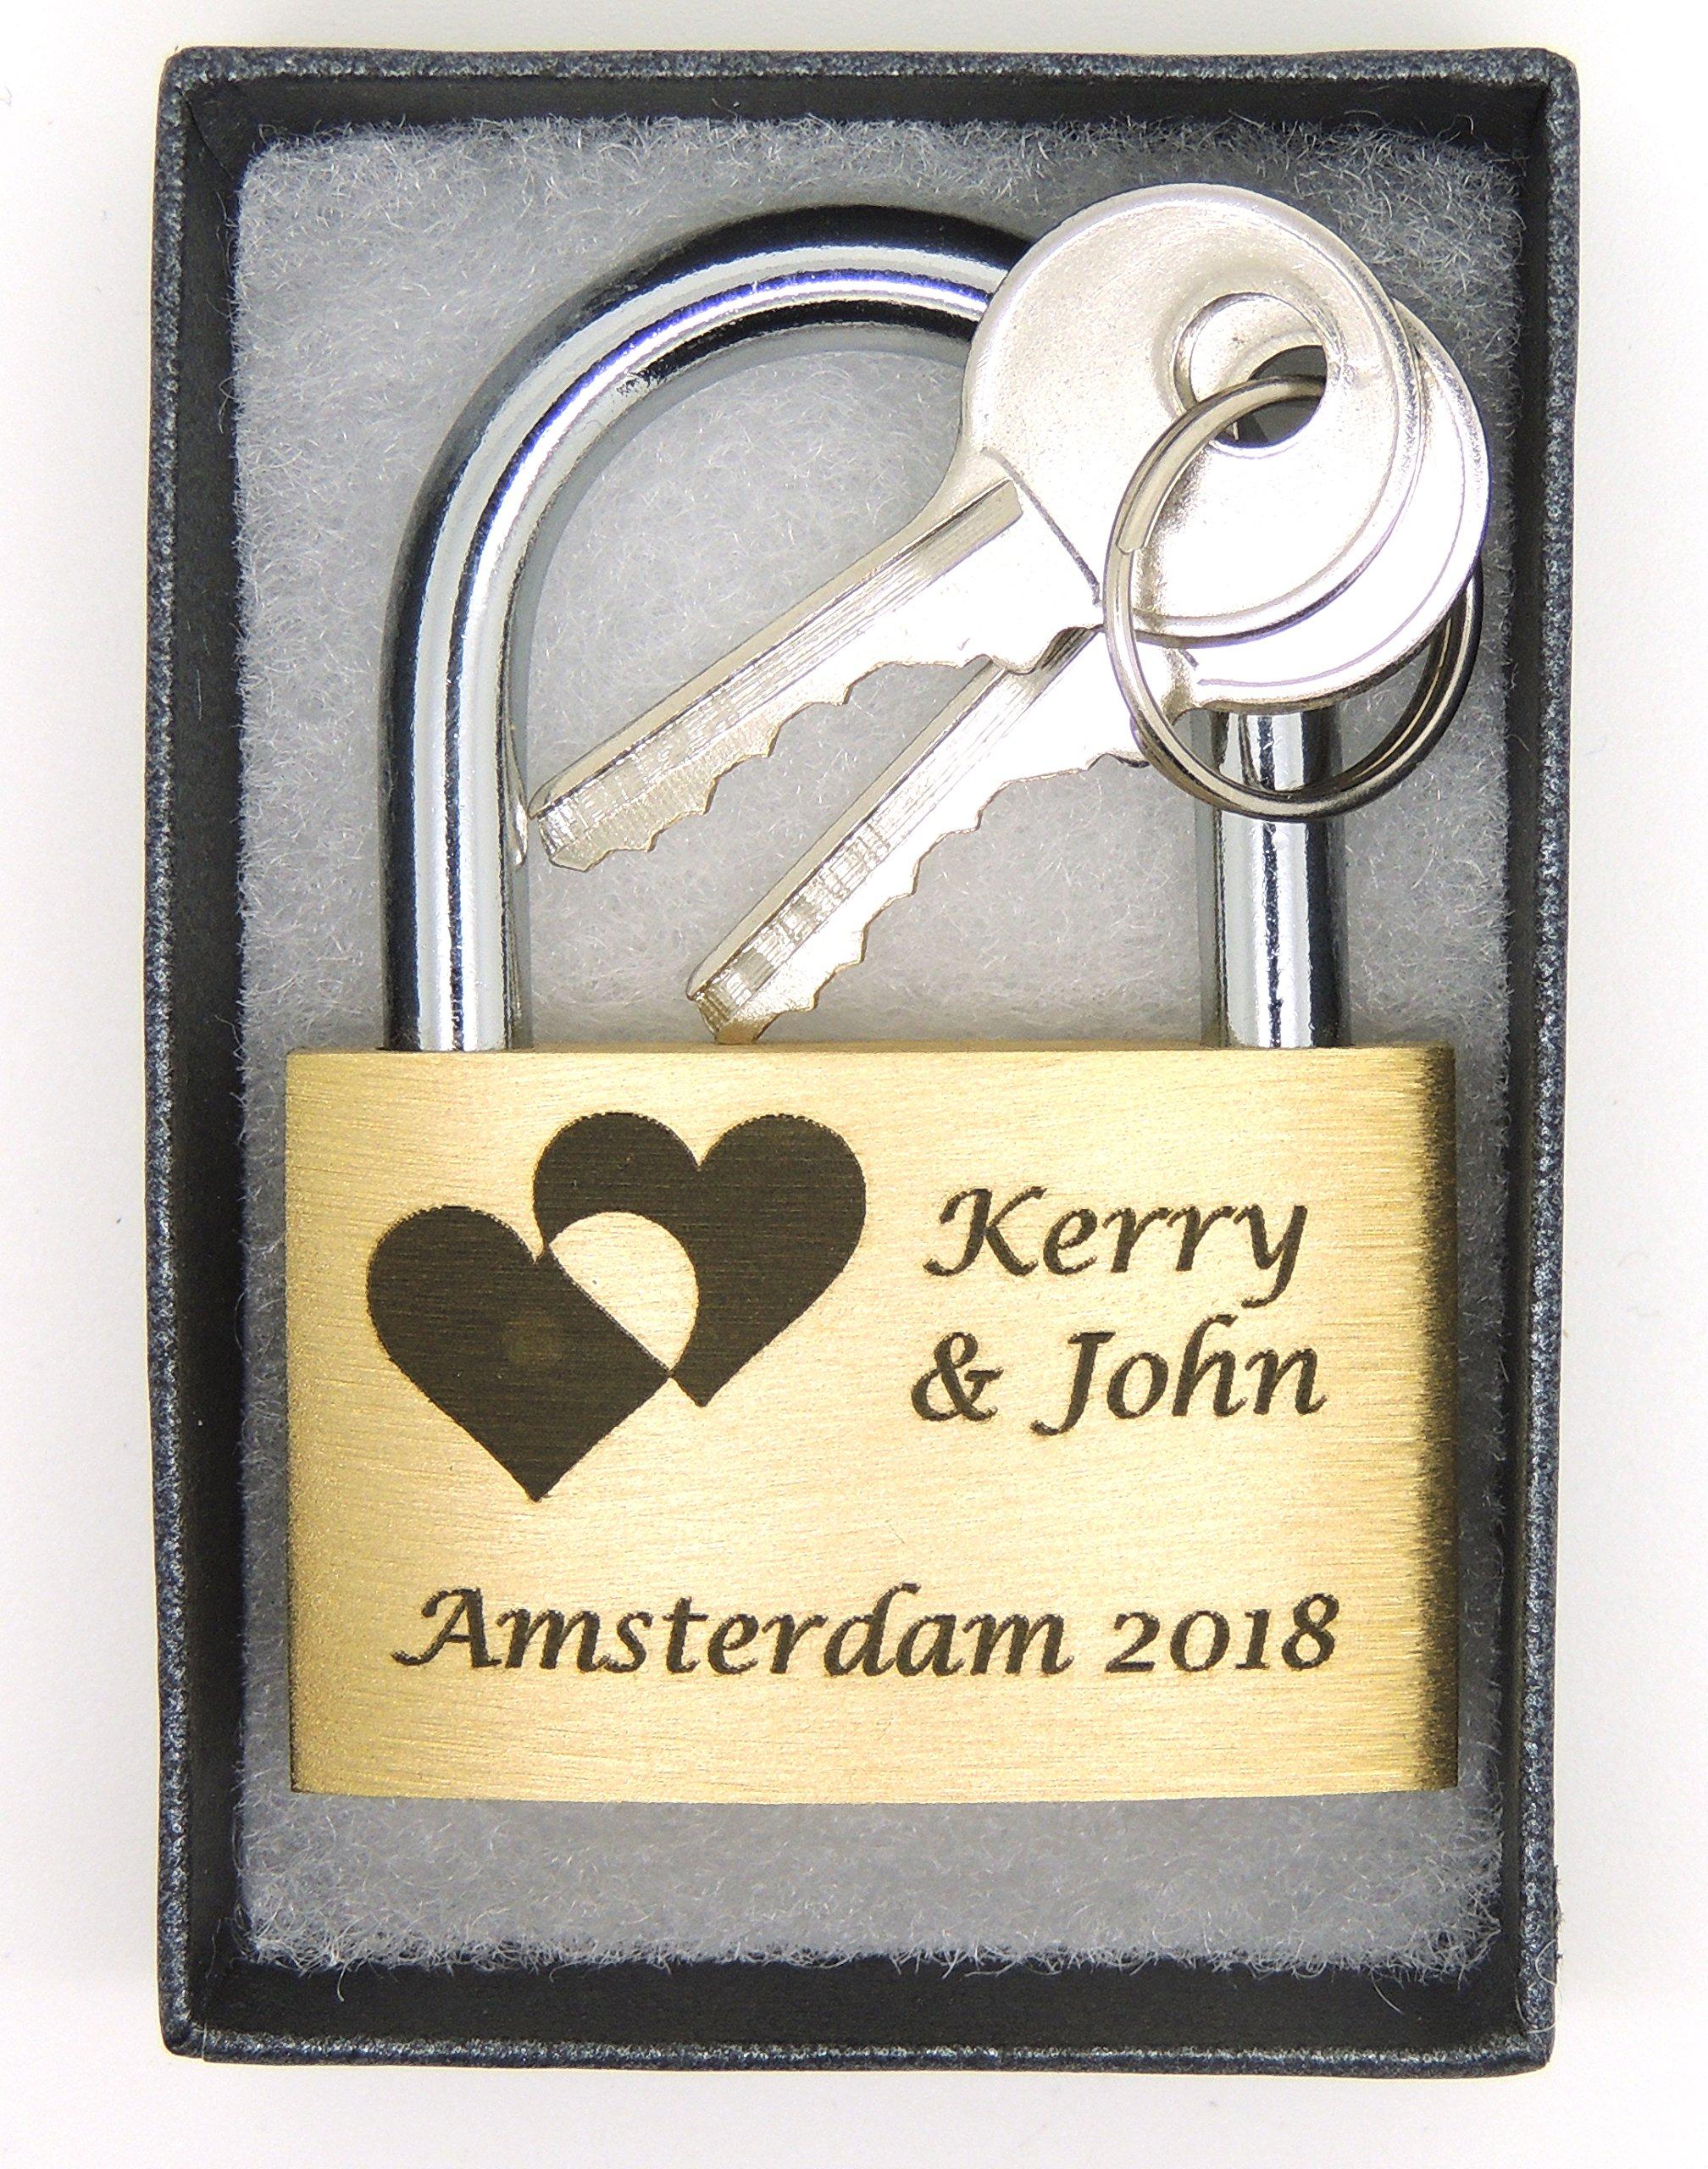 40mm. Both sides engraved padlock. Gift box